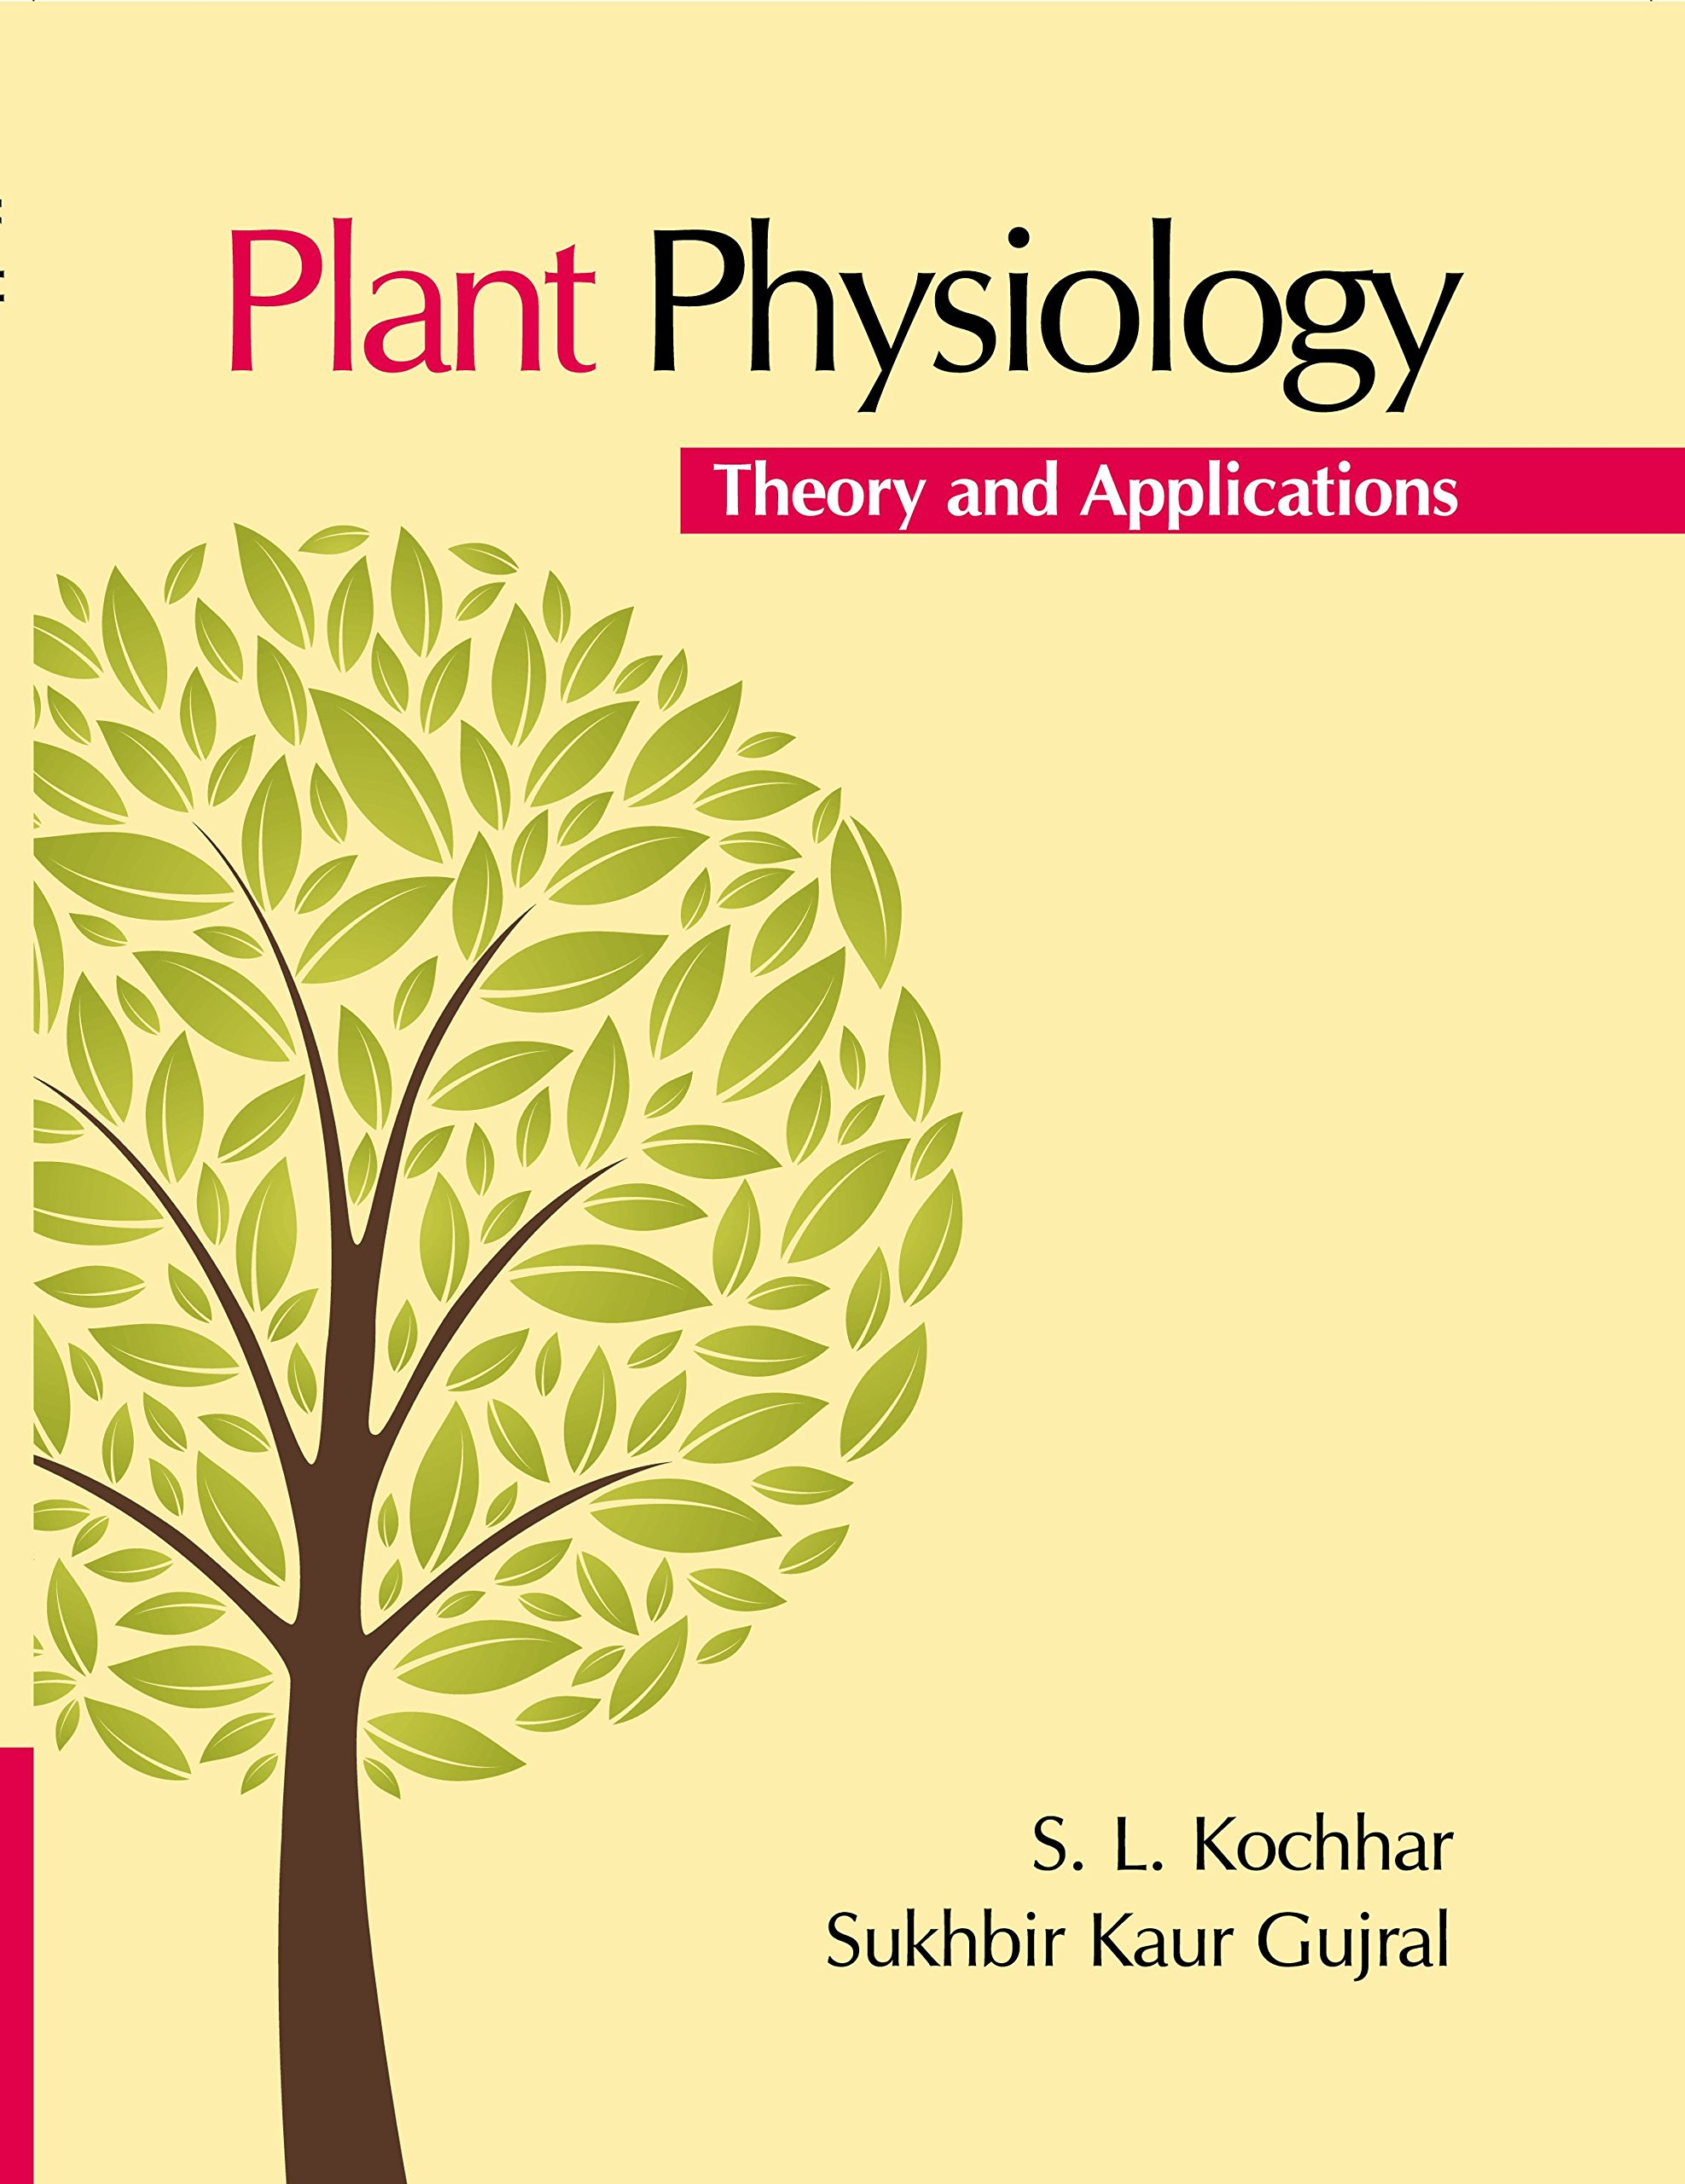 Plant Physiology: Kochhar: 9789385386213: Amazon com: Books